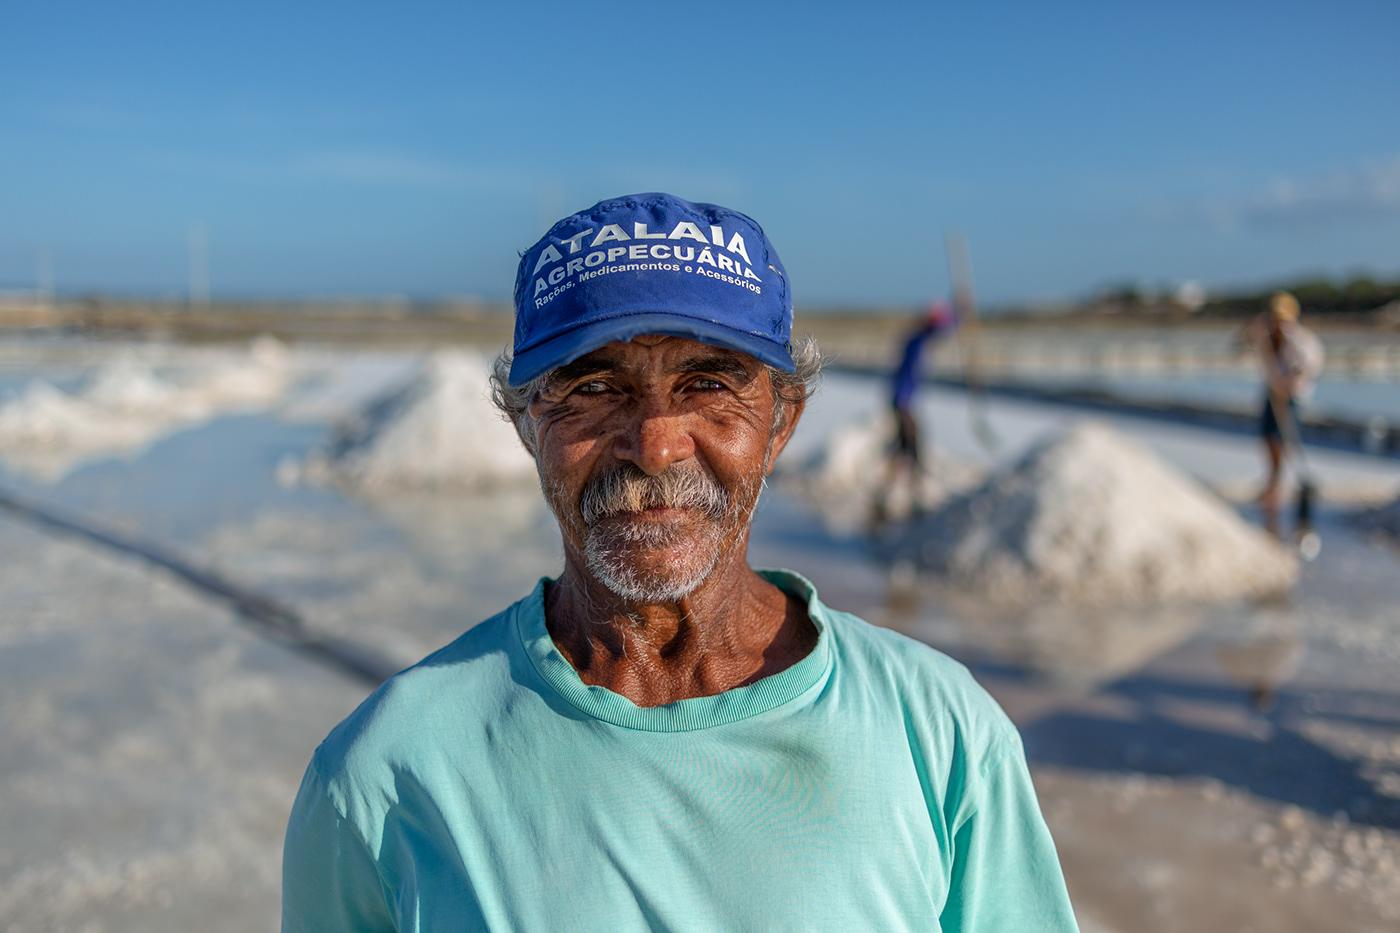 Aerial Photography brazillian development Documentary Photography economy environment LIFECOAST Salt sea South America